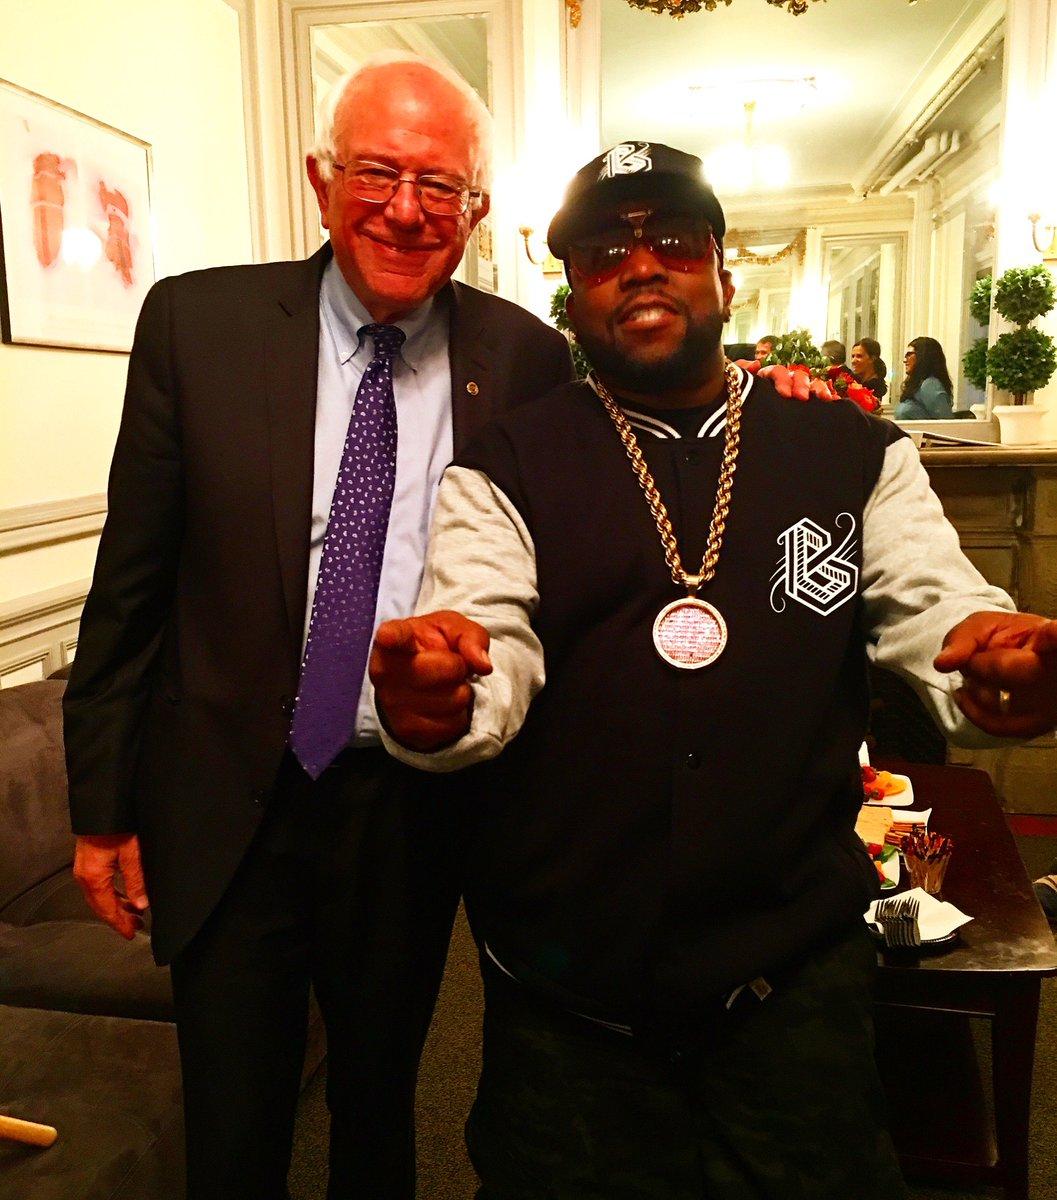 Chopping it up With Bernie Sanders #FeelTheBern #BernieSanders #BigGrams https://t.co/Uk4LfpxrL1